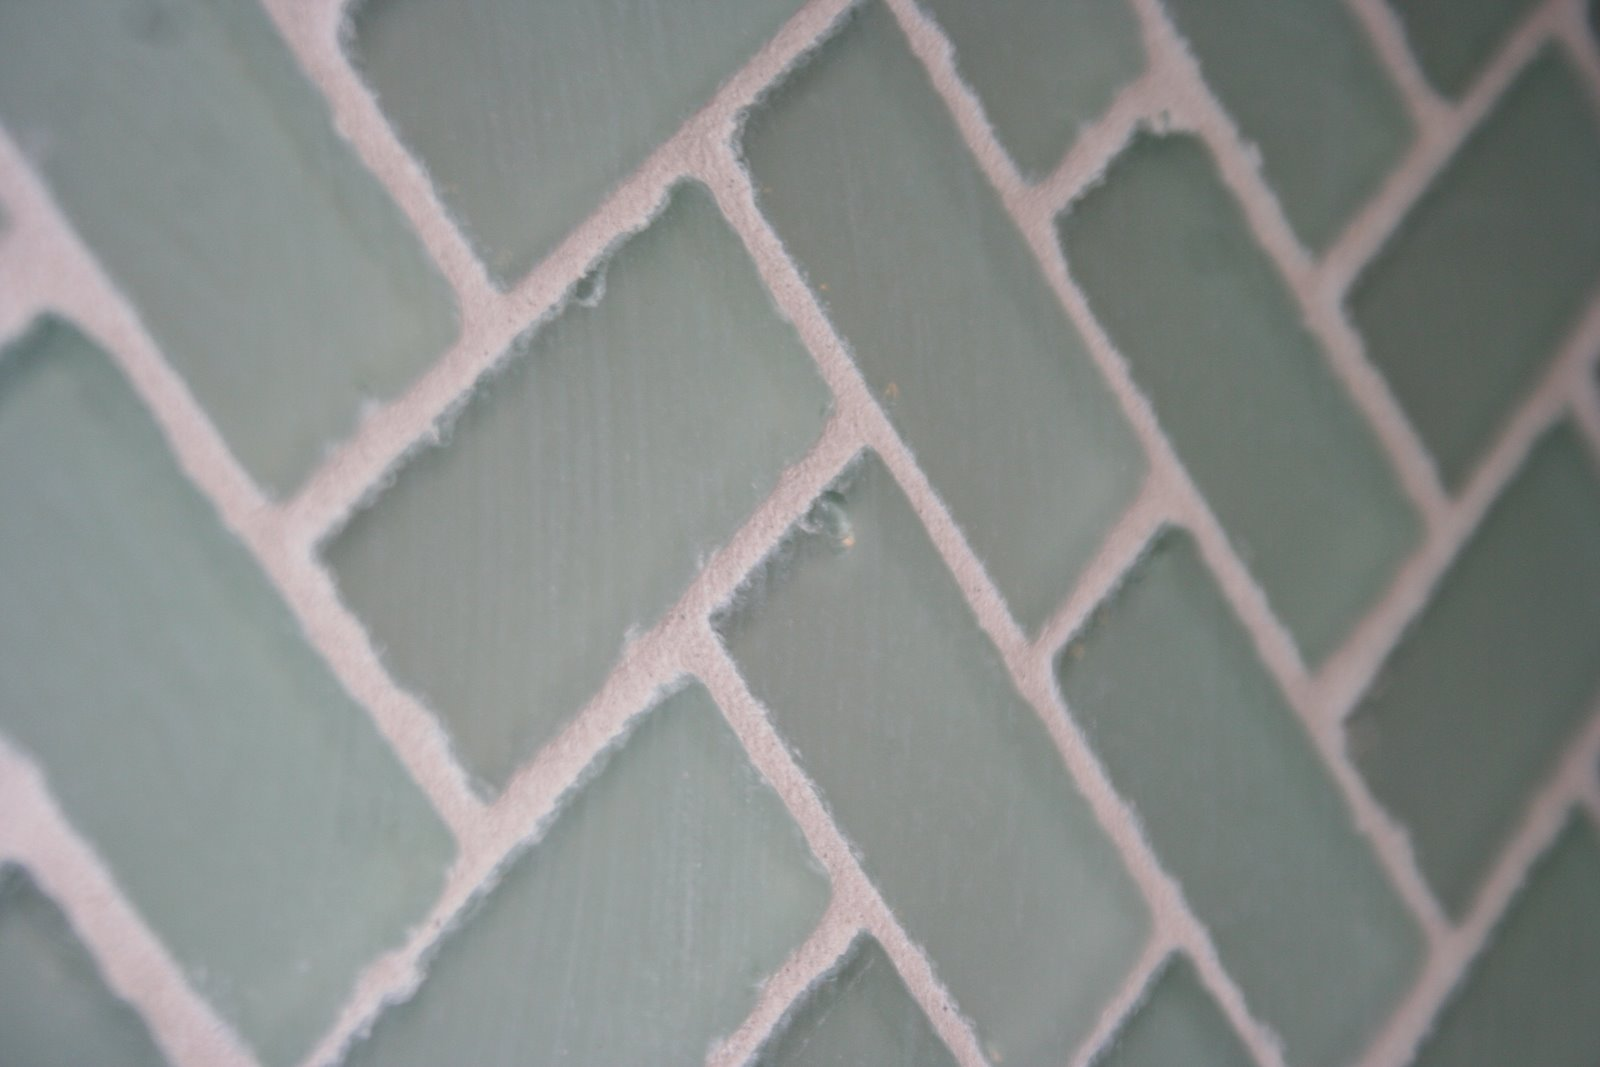 Failure Of Glass Mosaic Tile Aquatic Technology Pool